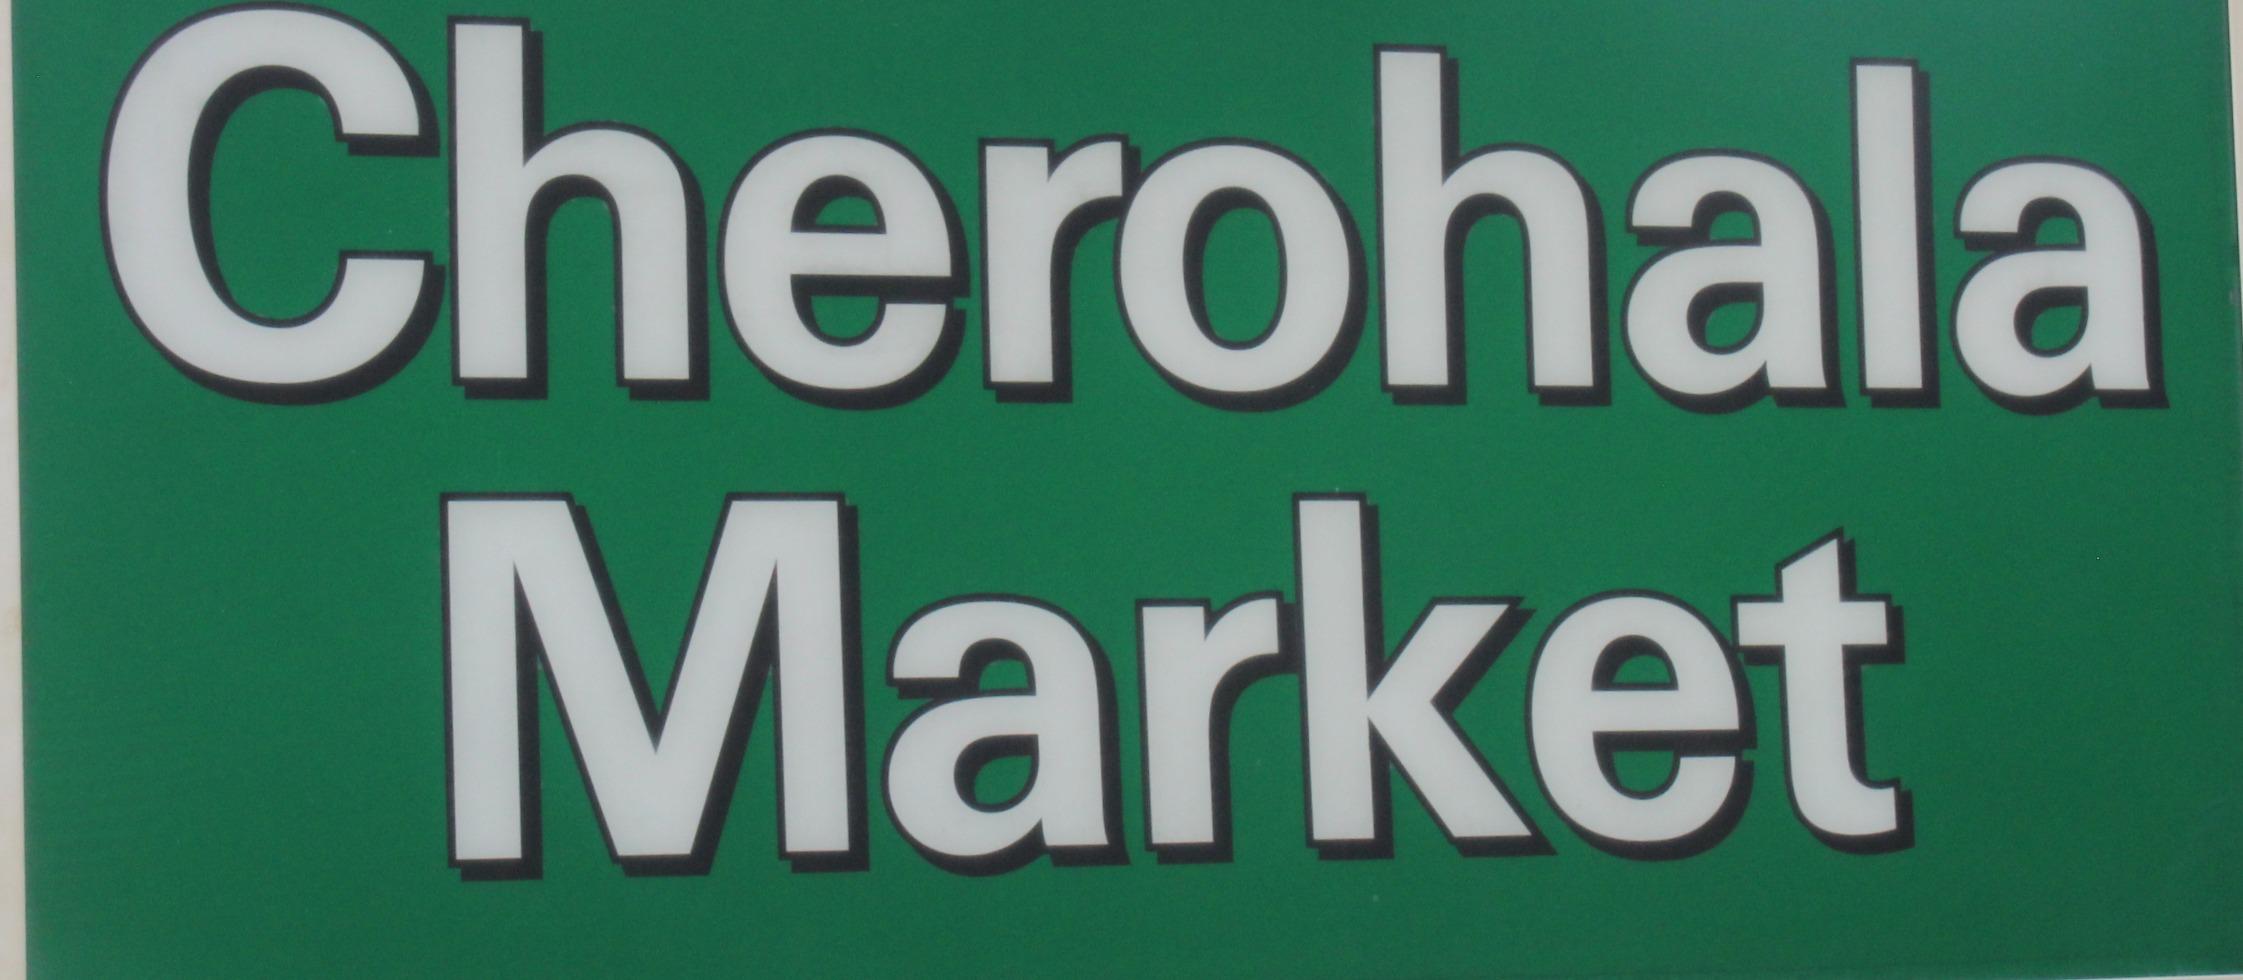 Cherohala Market